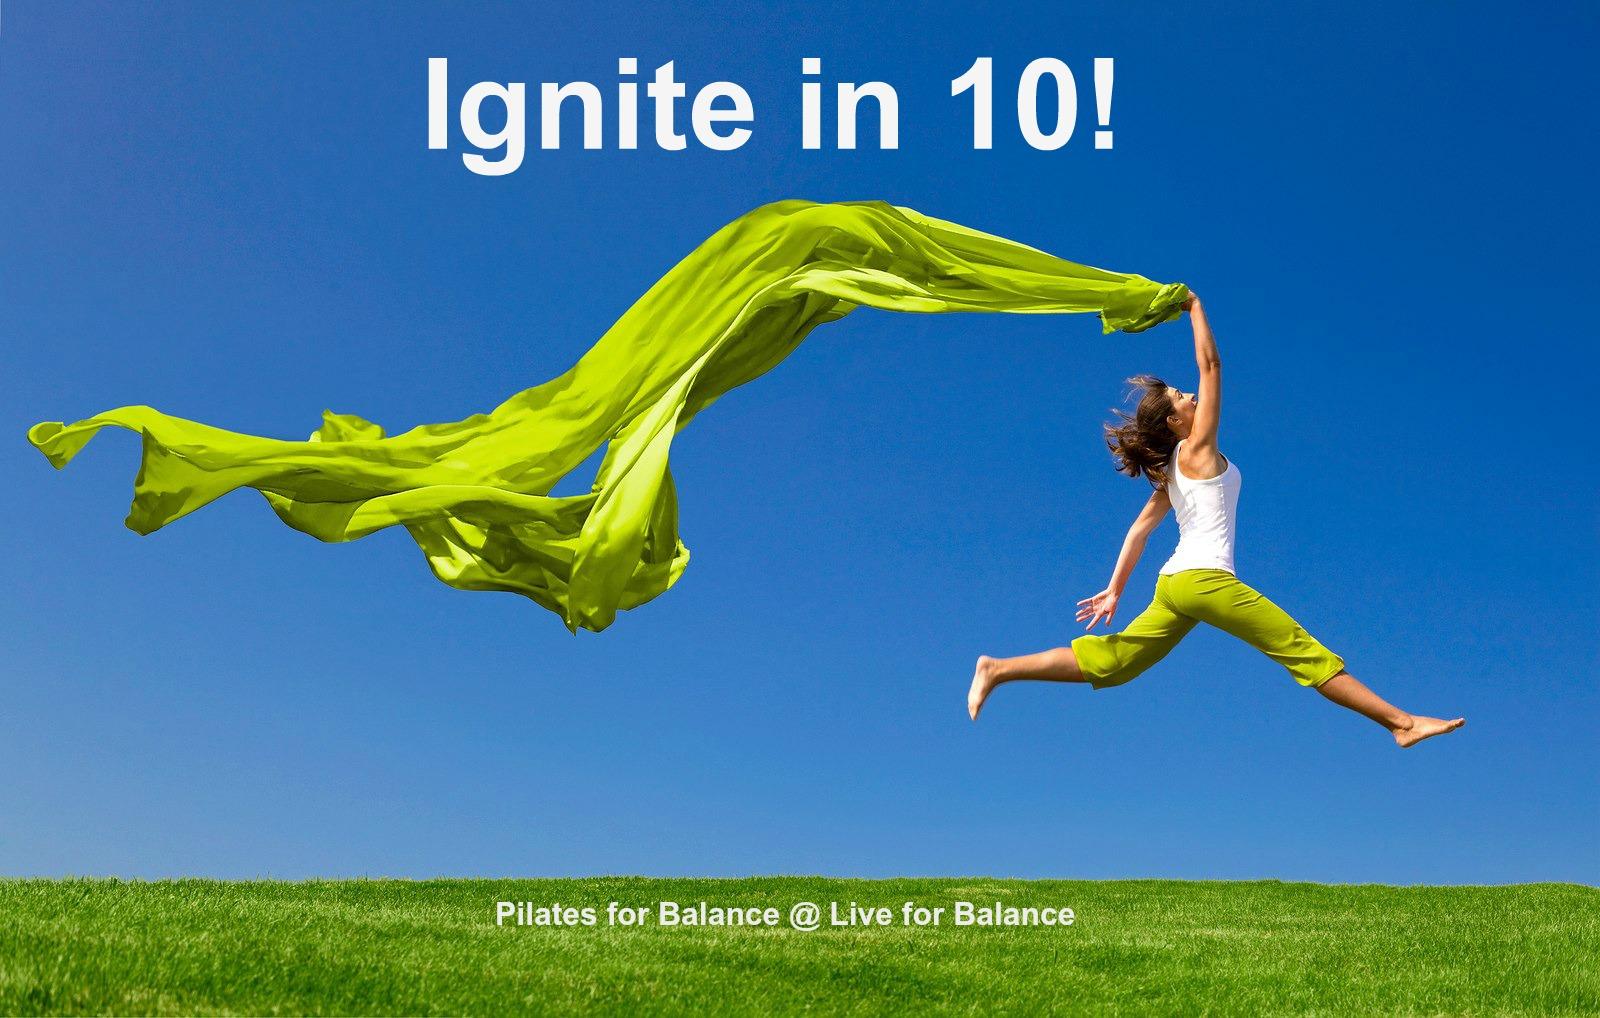 Beautiful-young-woman-jumping-SizeMedium-1509540531.jpg